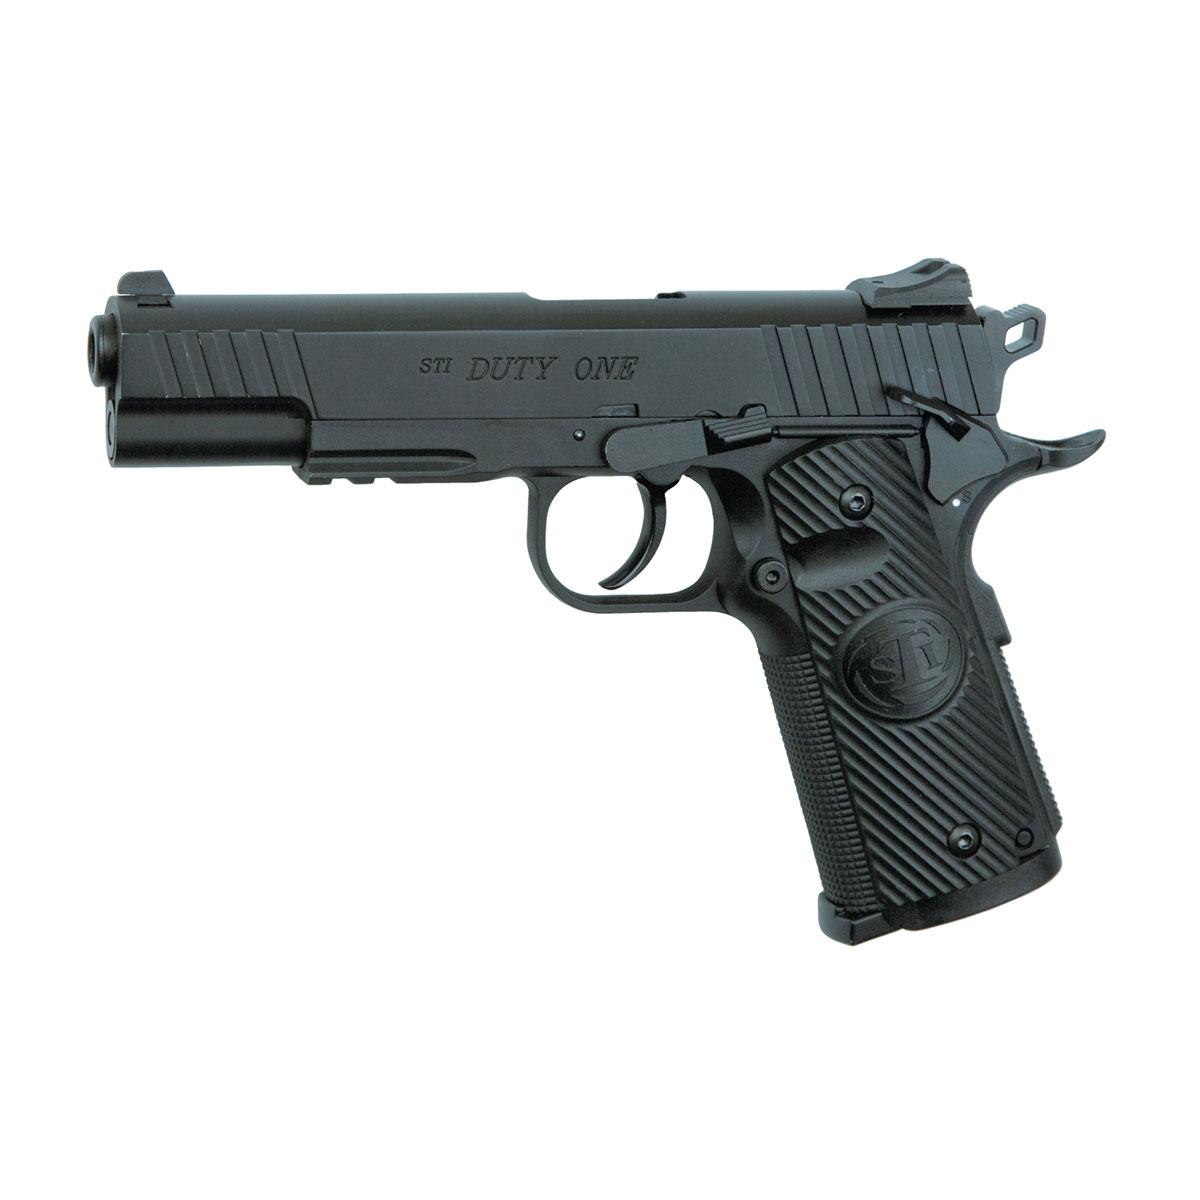 ASG STI Duty One пистолет пневматический, Blowback, CO2, 4,5 мм, цвет: Black (16732) цена